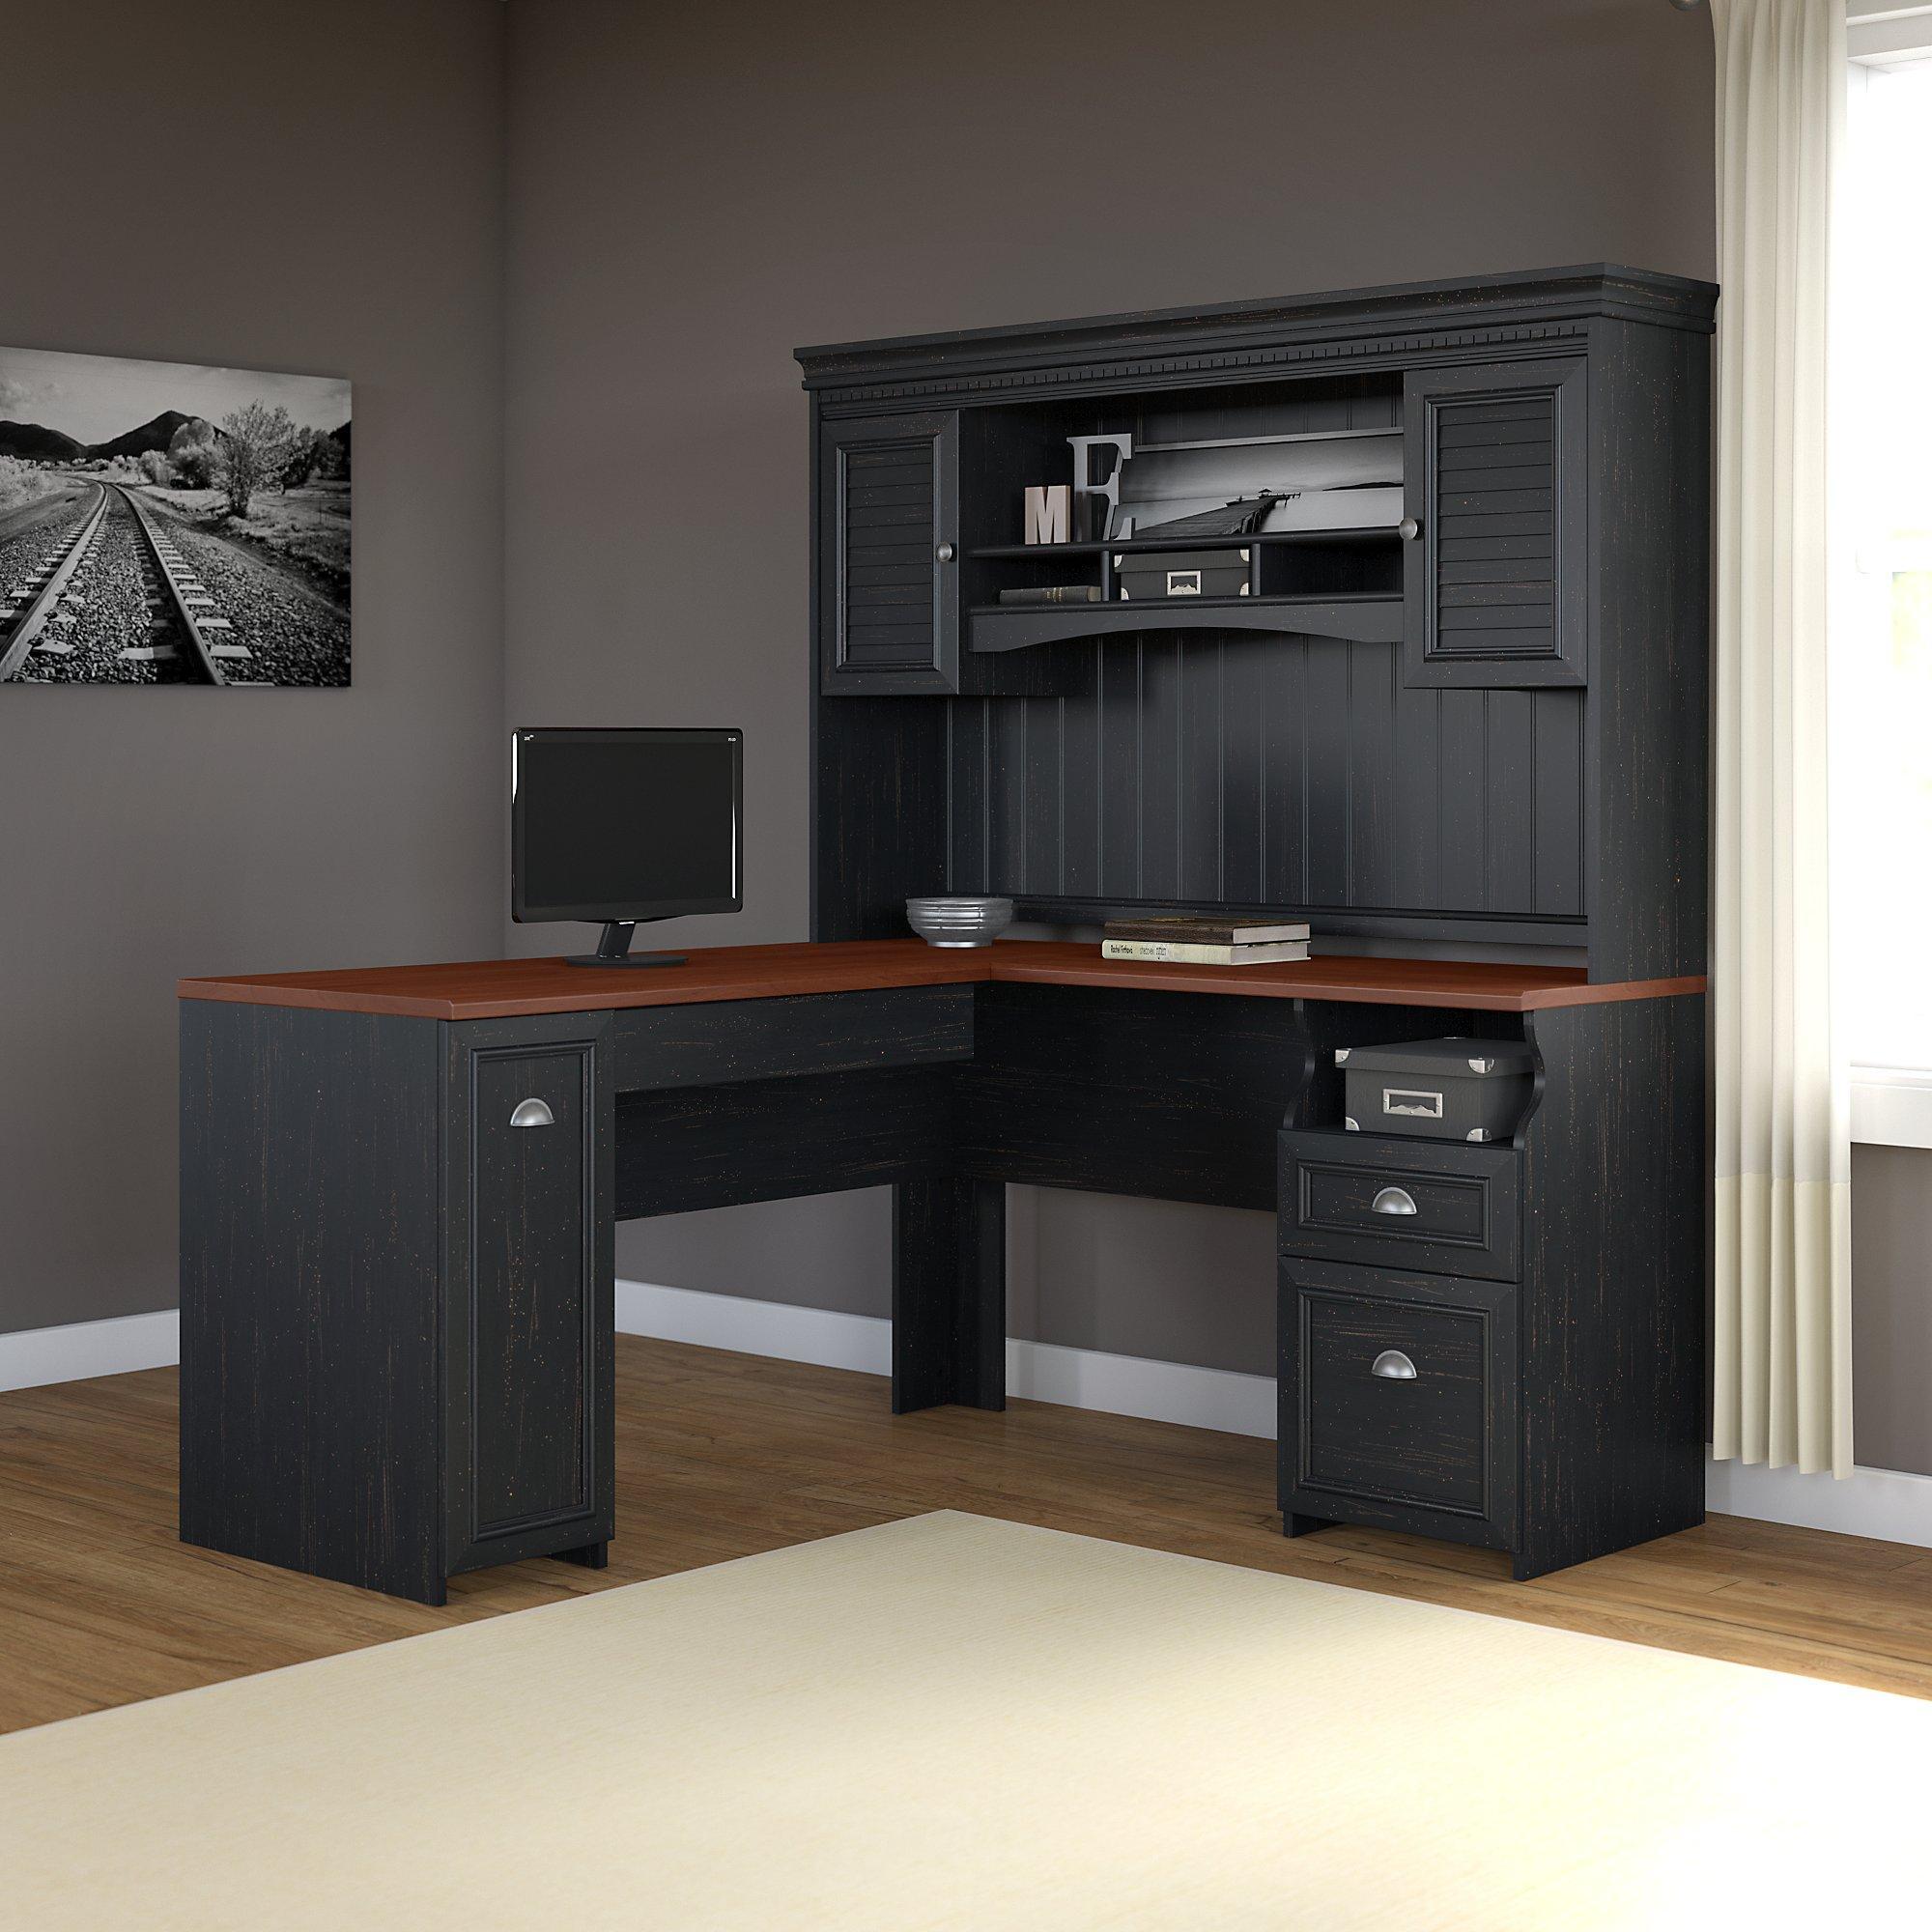 fairview l shaped desk with hutch in antique black kitchen dining. Black Bedroom Furniture Sets. Home Design Ideas